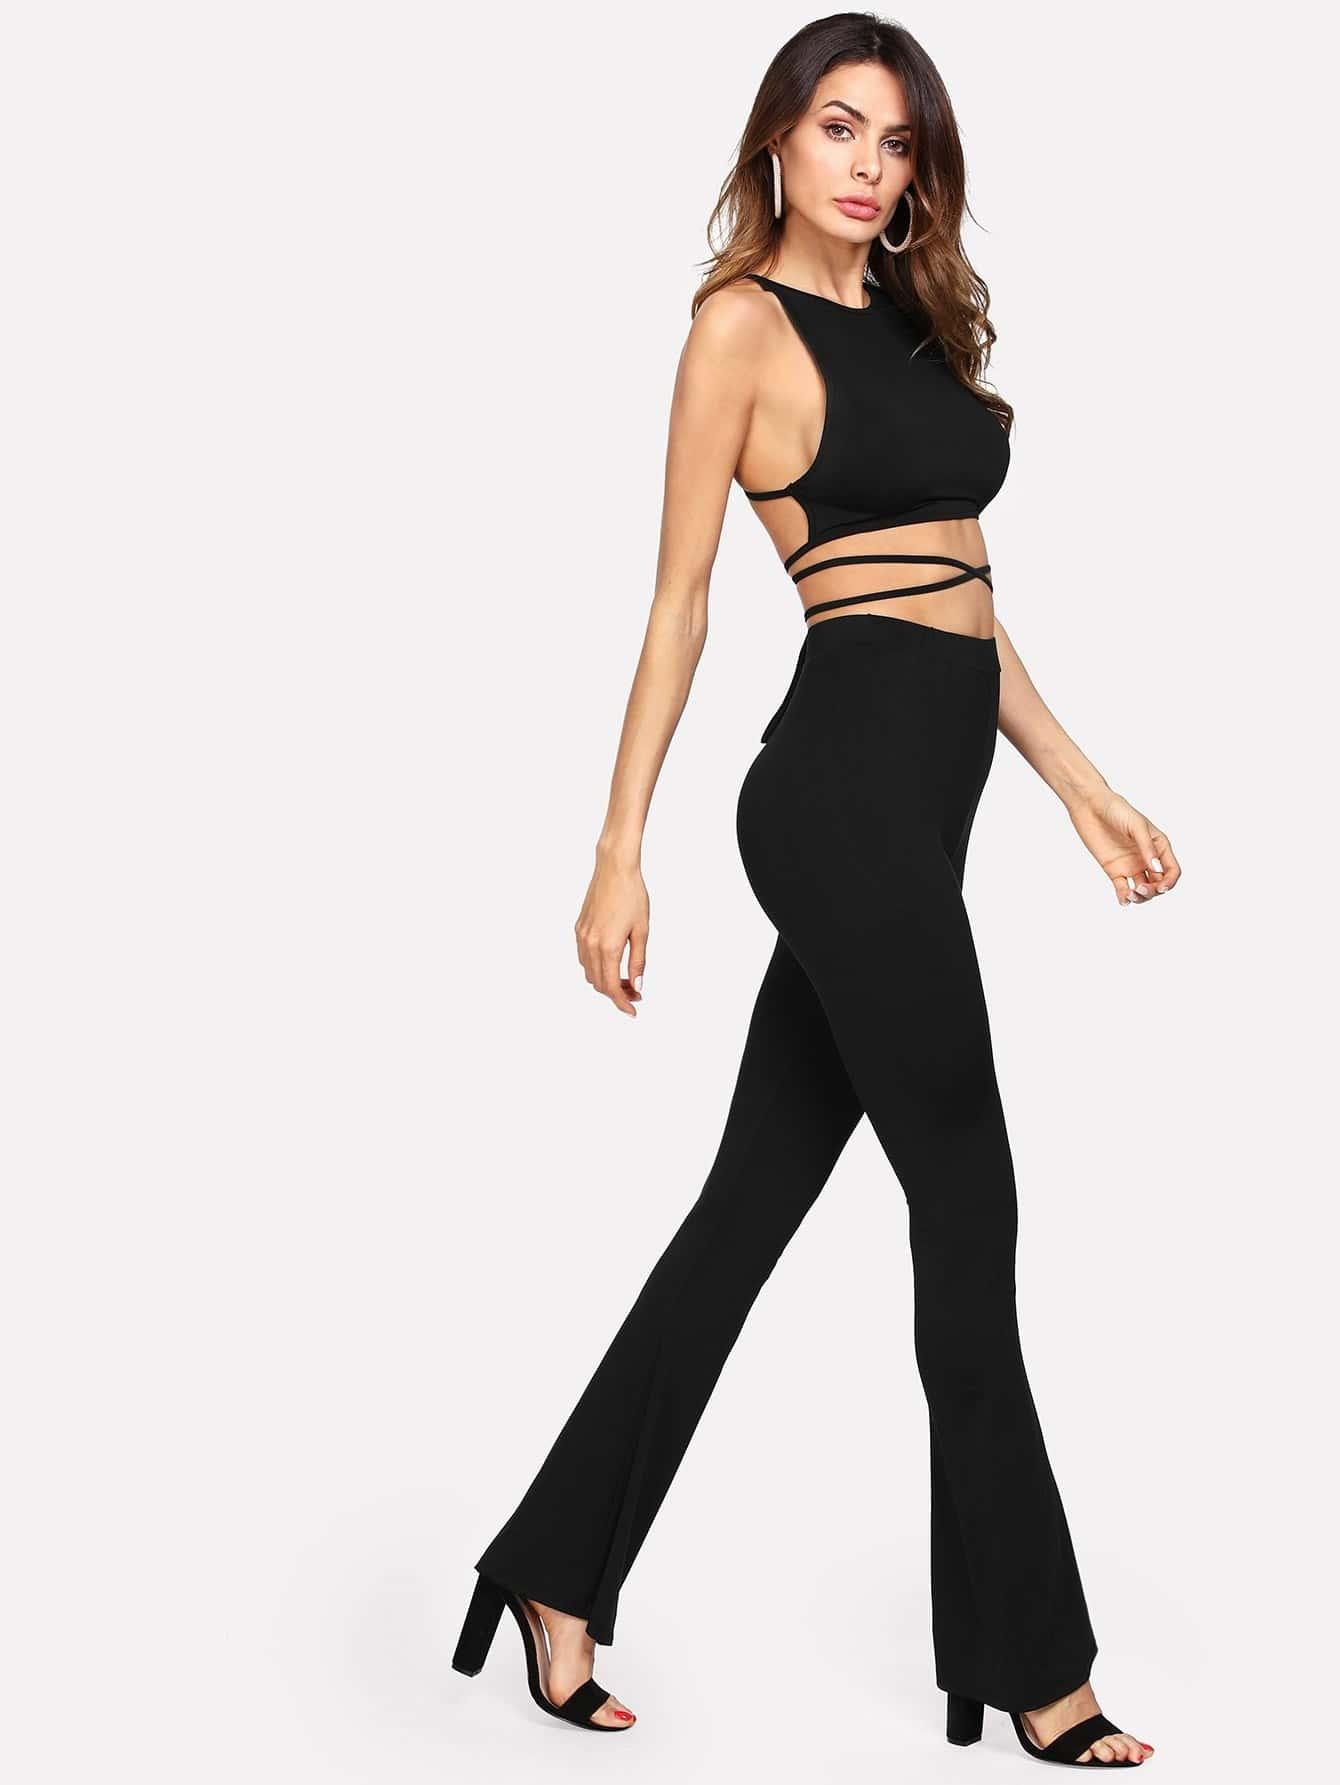 Lace Up Backless Crop Top & Flare Hem Pants Set